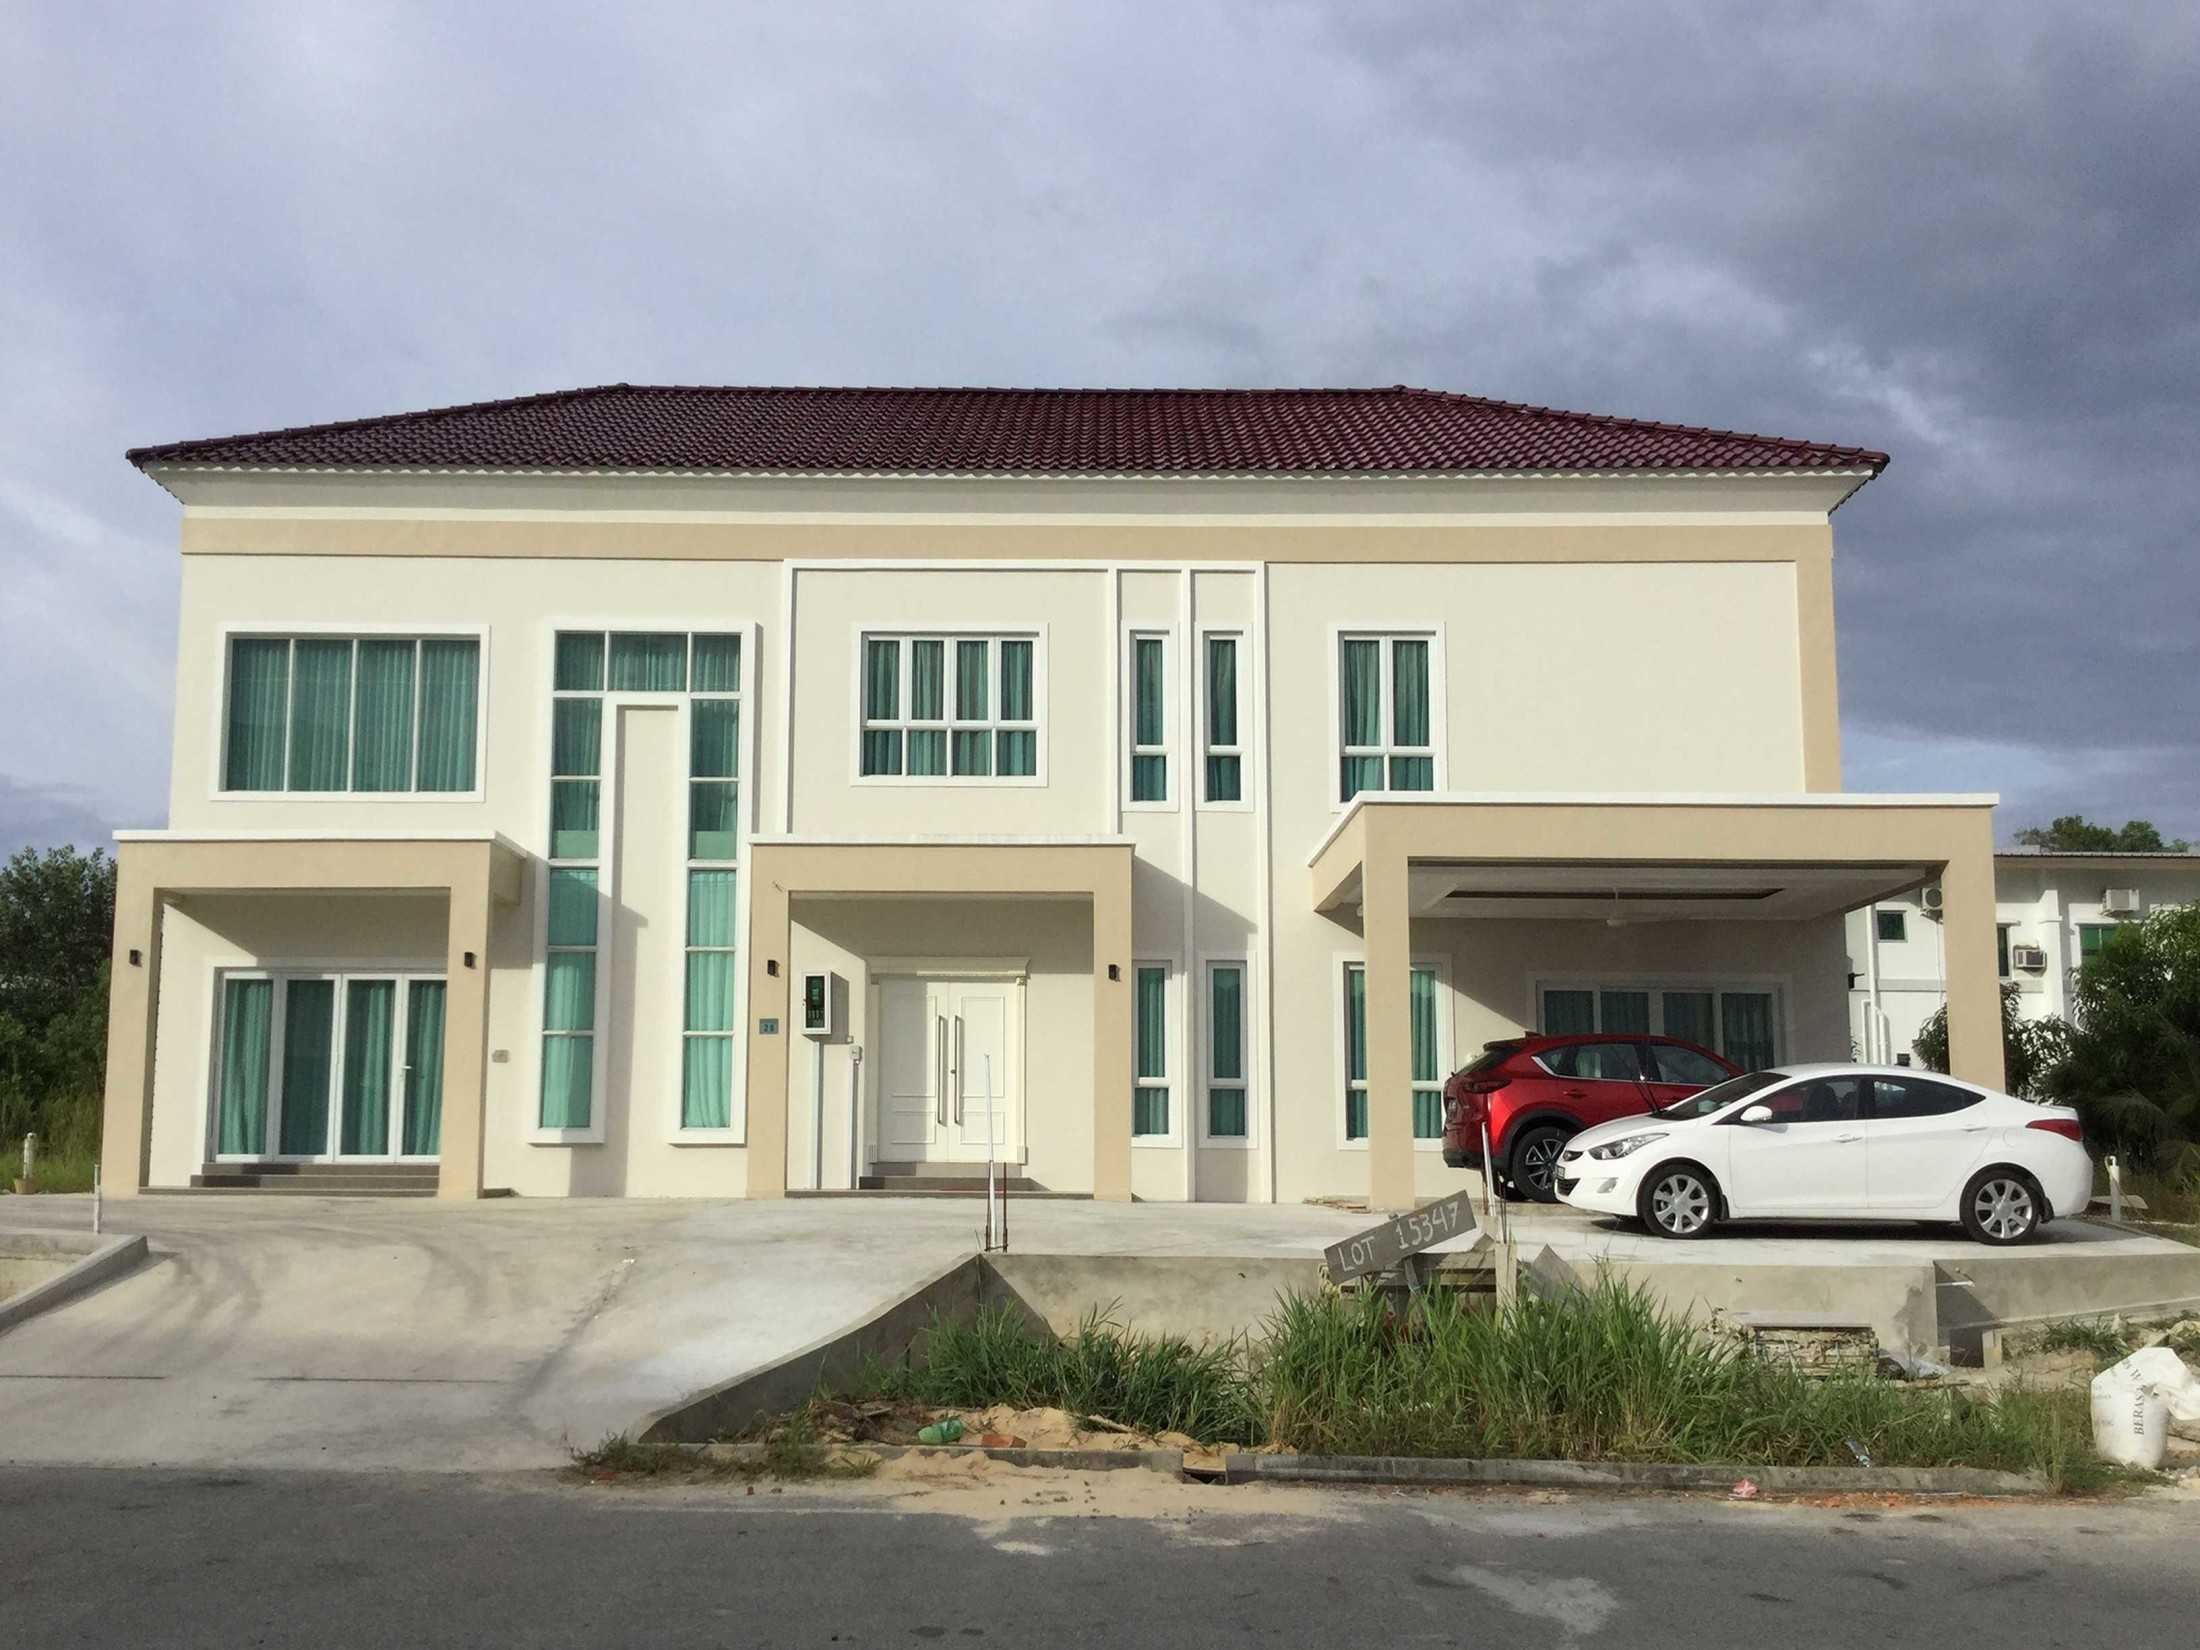 Pt. Leeyaqat Karya Pratama Design & Build Lot – 15347 Brunei Darussalam Brunei Darussalam Pt-Leeyaqat-Karya-Pratama-Design-Build-Lot-15347  63656